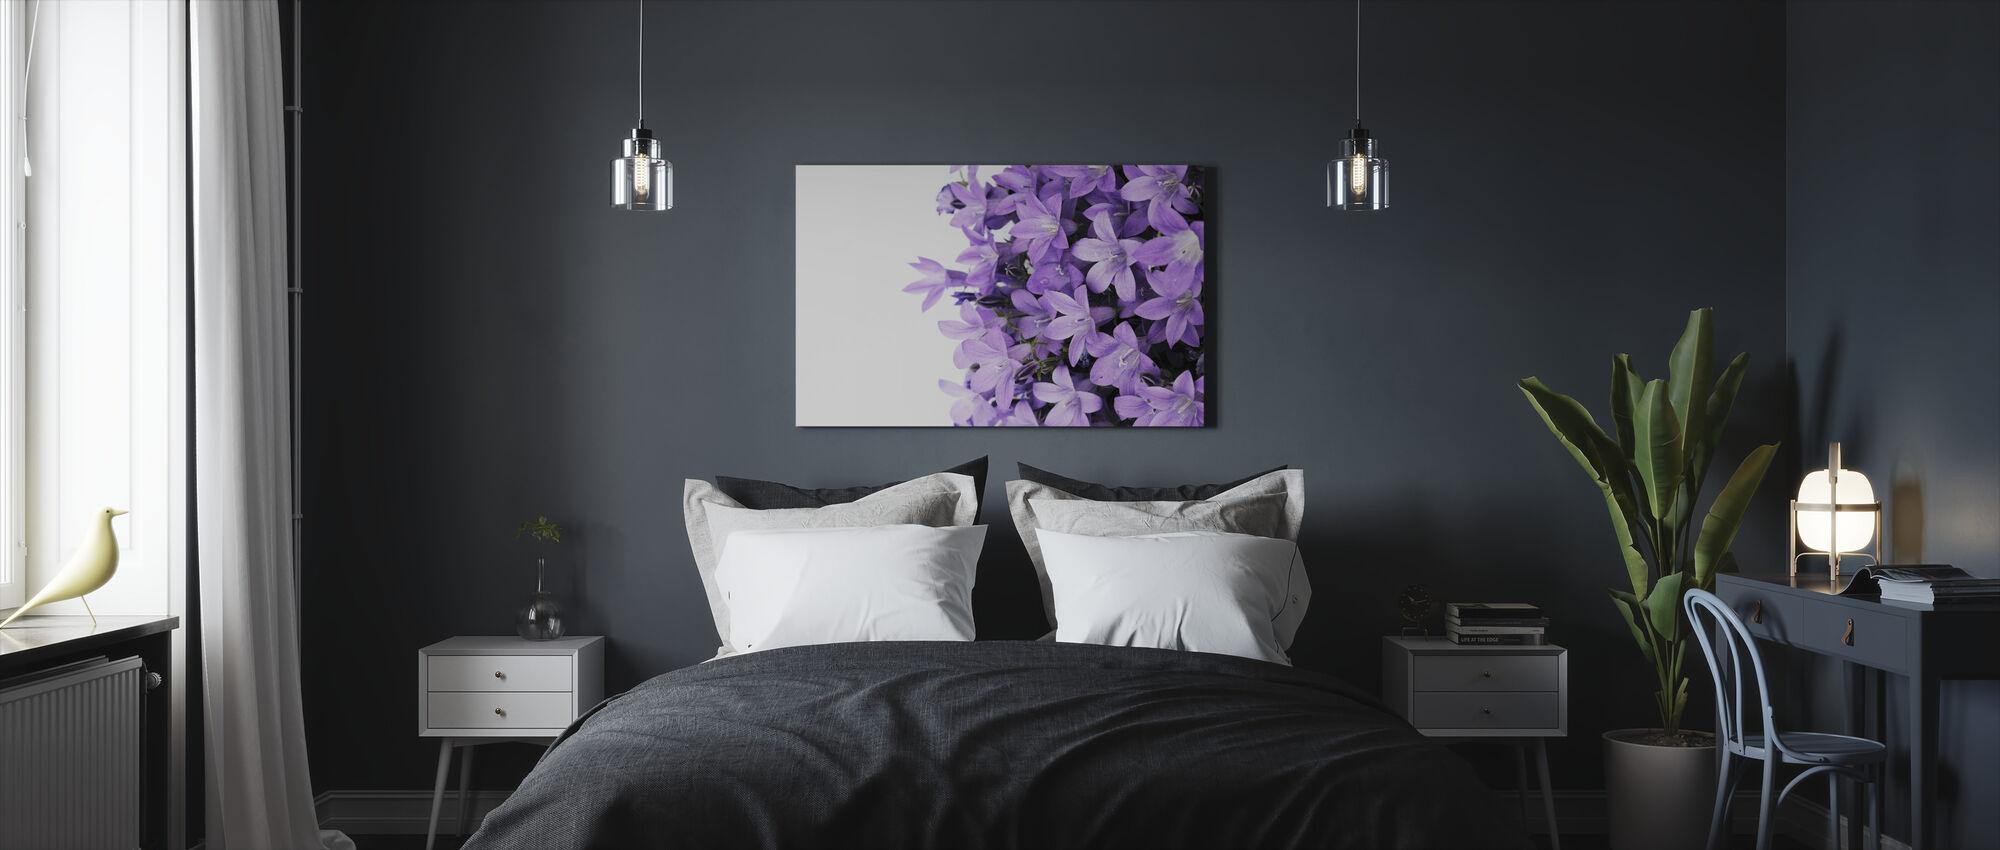 Paarse Bloemen - Canvas print - Slaapkamer